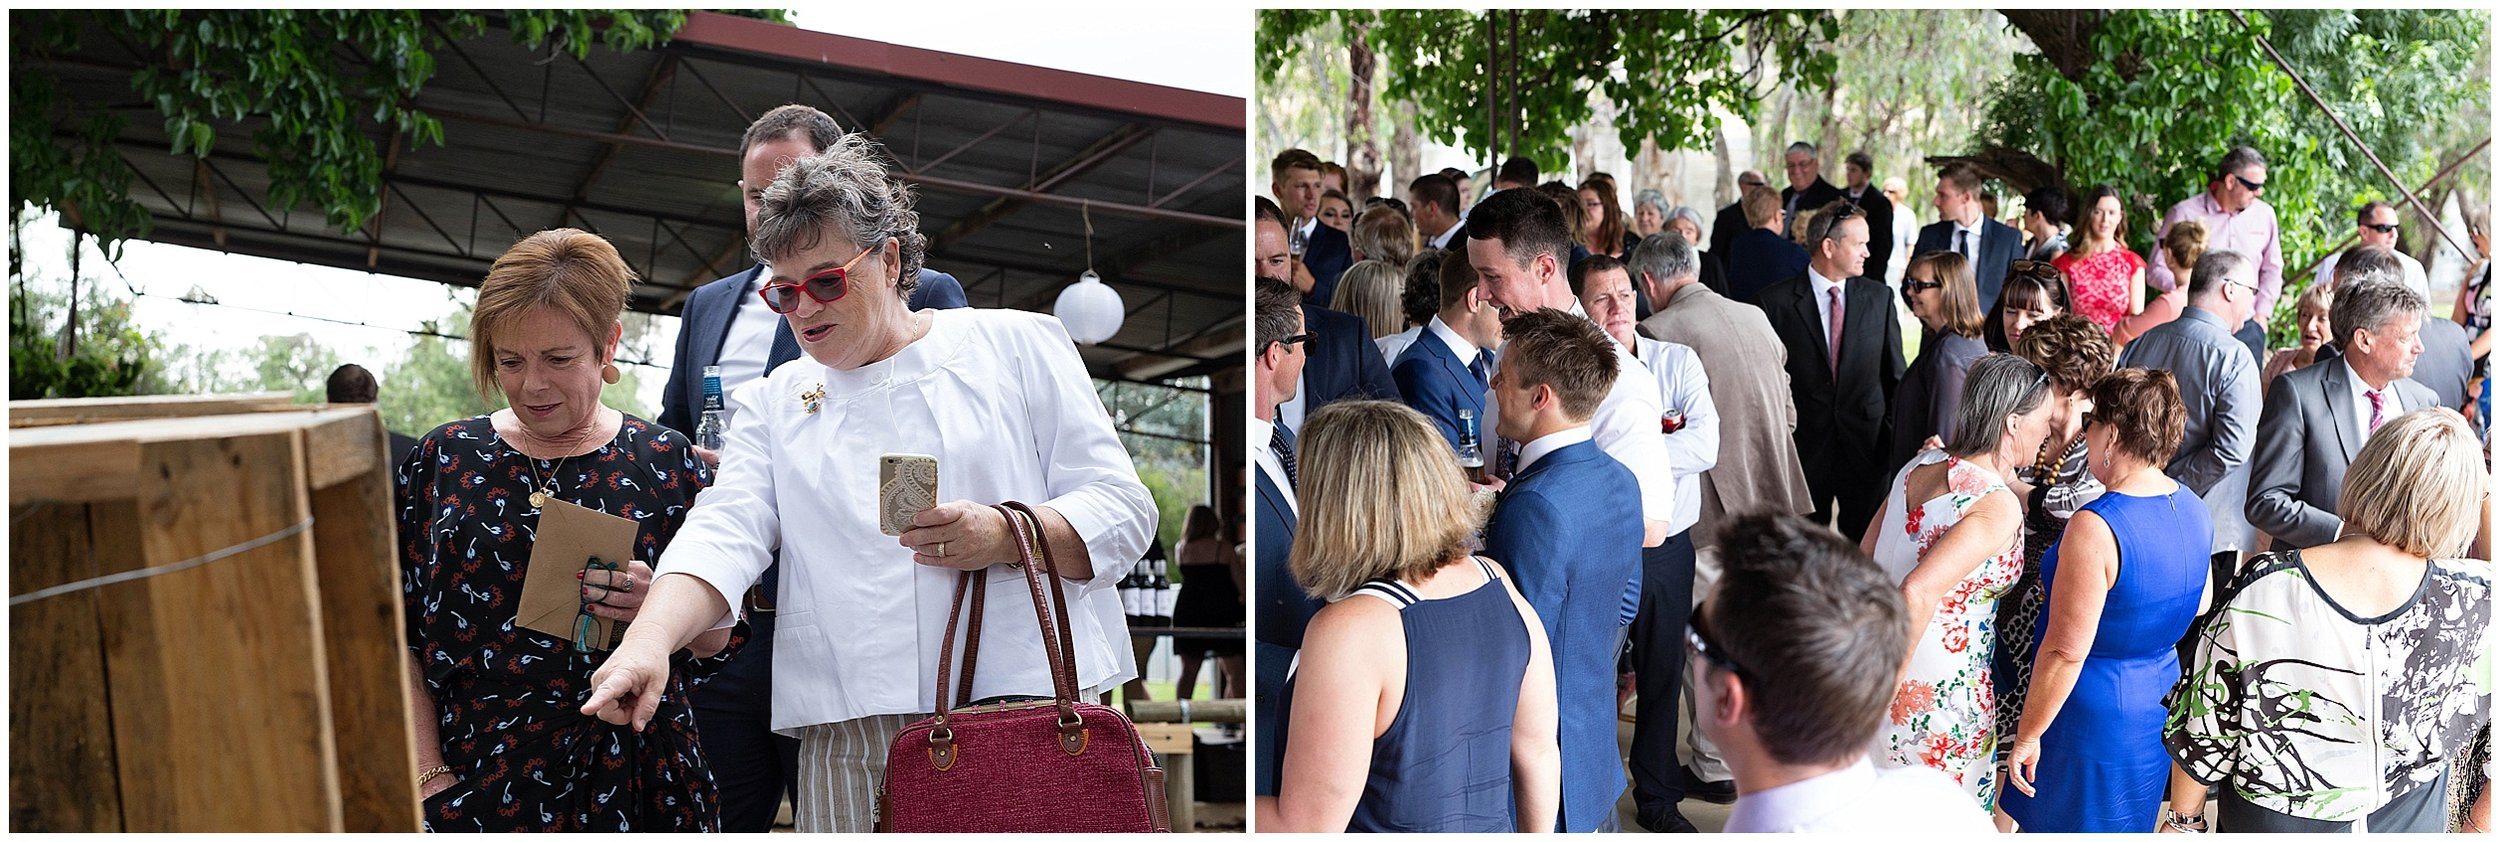 shepparton-wedding-photographer_0152.jpg